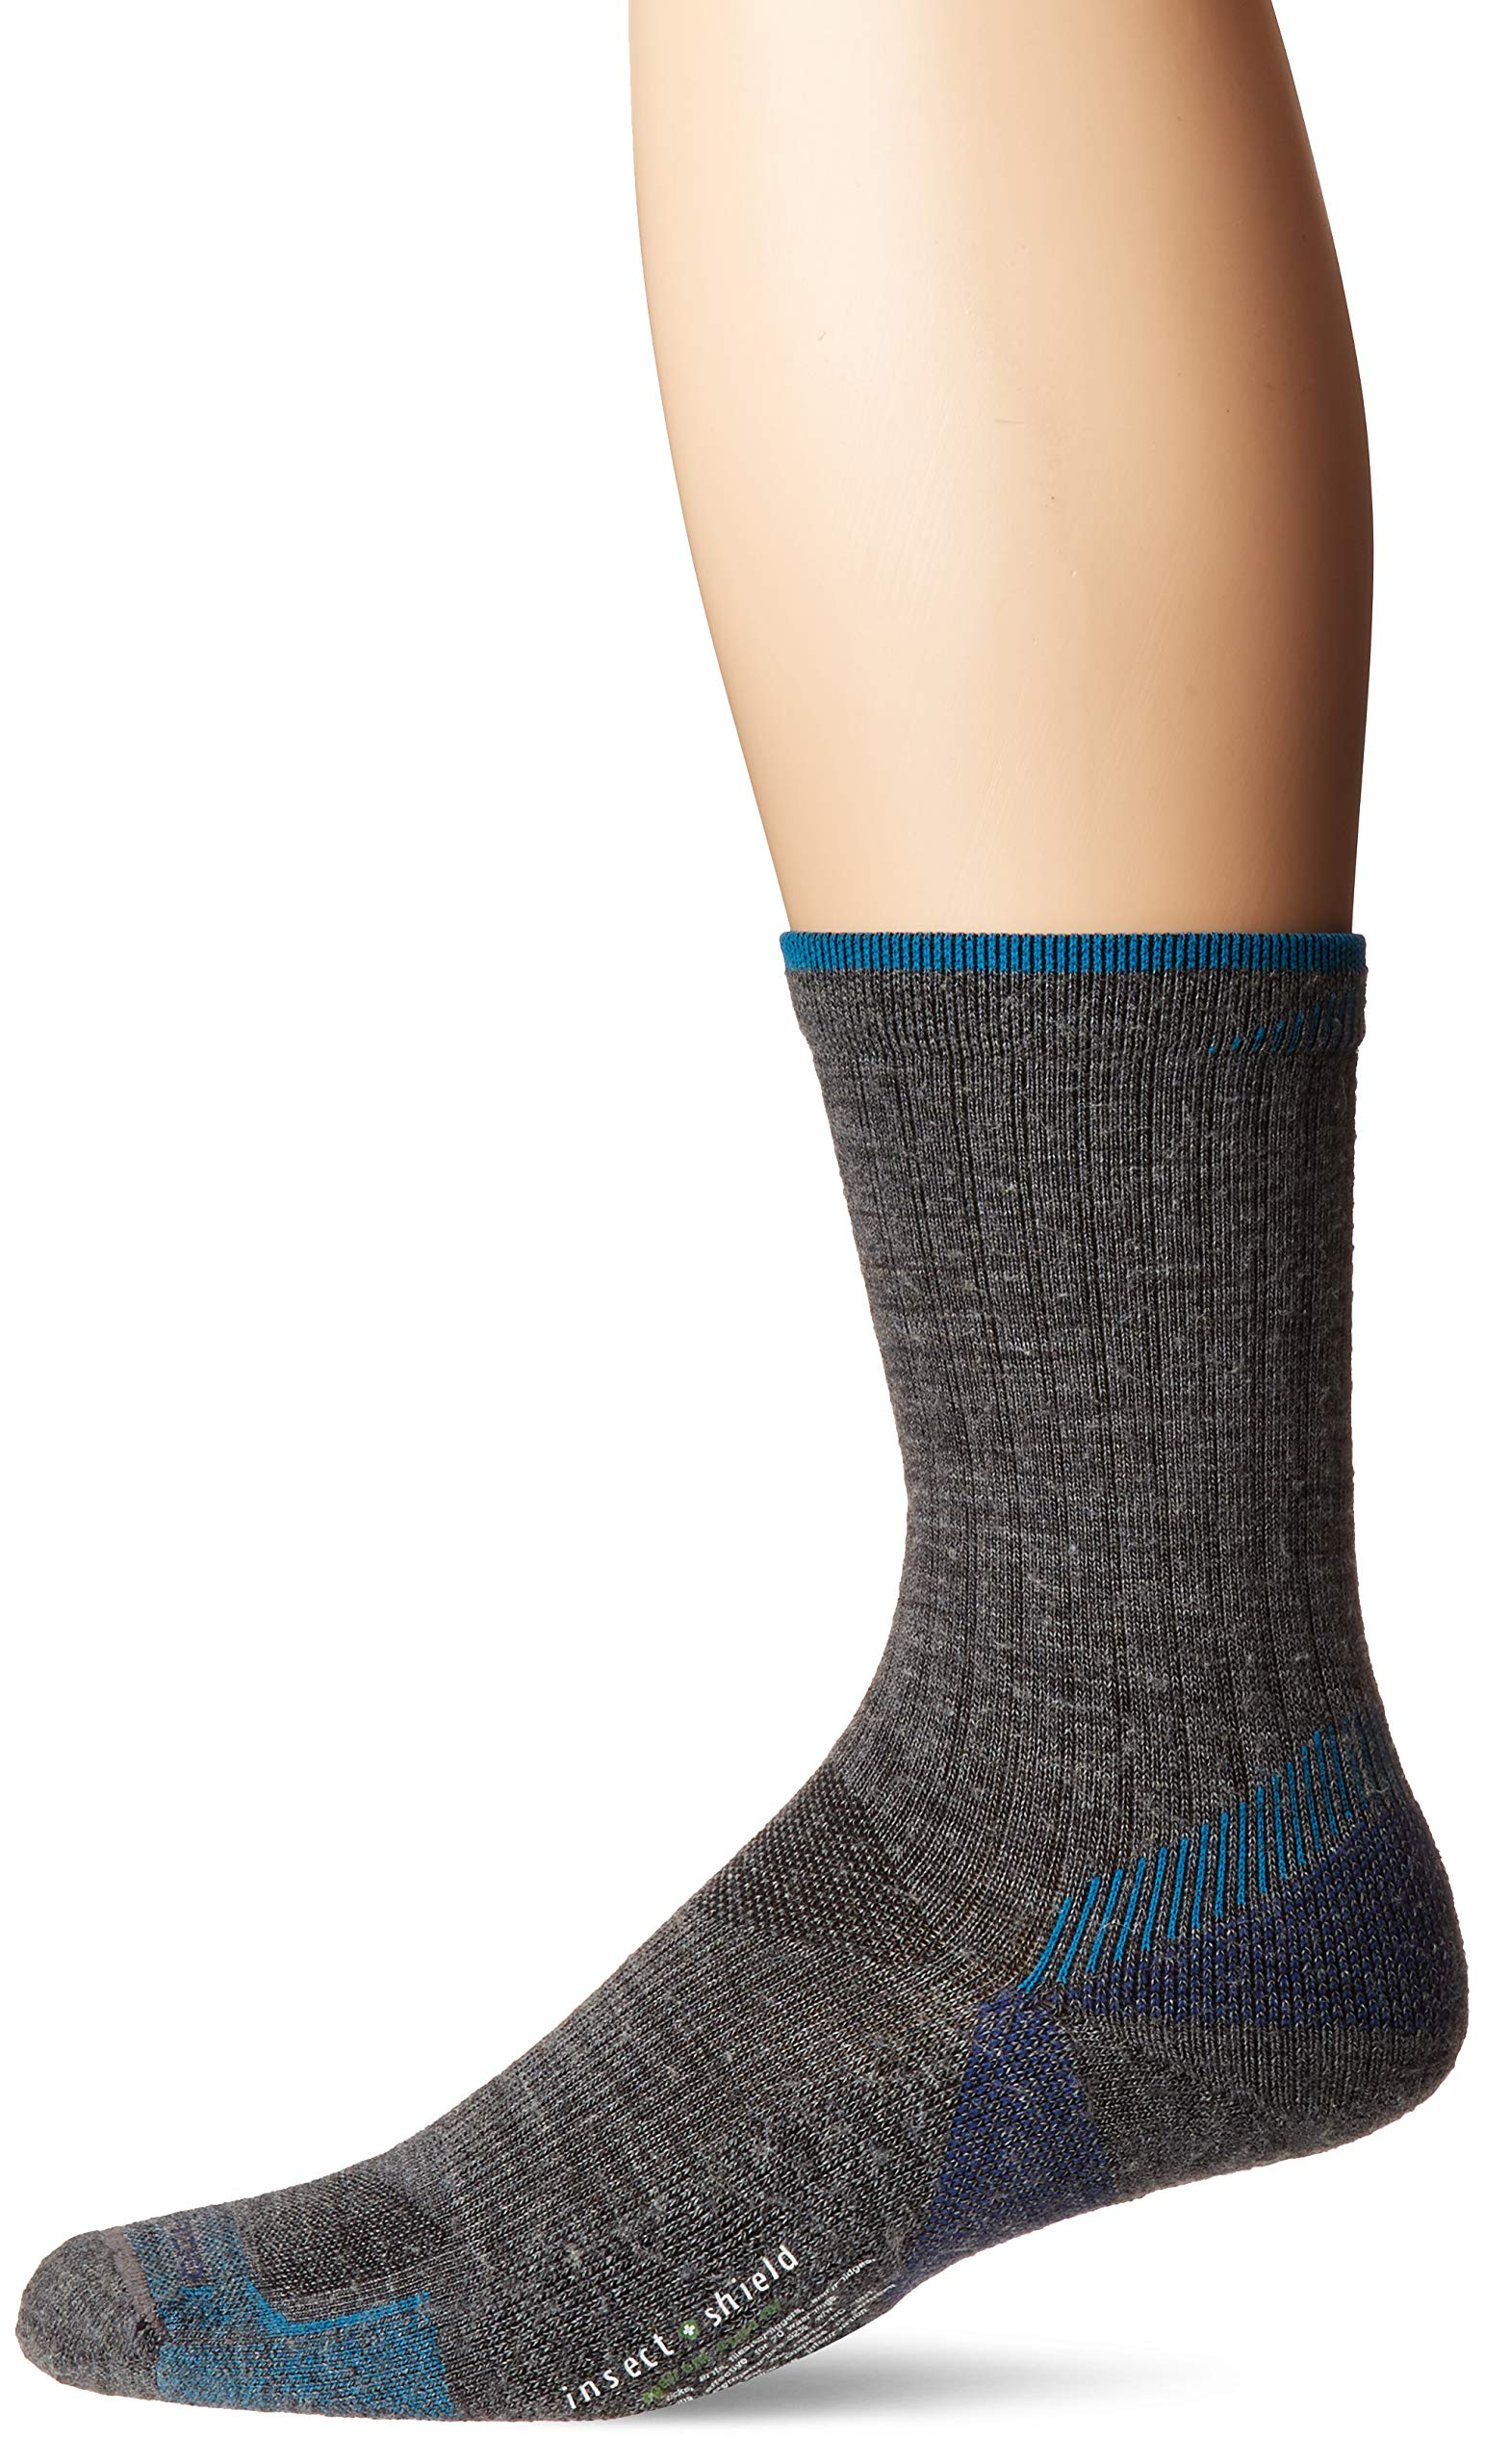 ExOfficio Women's BugsAway Solstice Canyon Crew Sock, Grey Heather/Algiers Blue, Medium/Large by ExOfficio